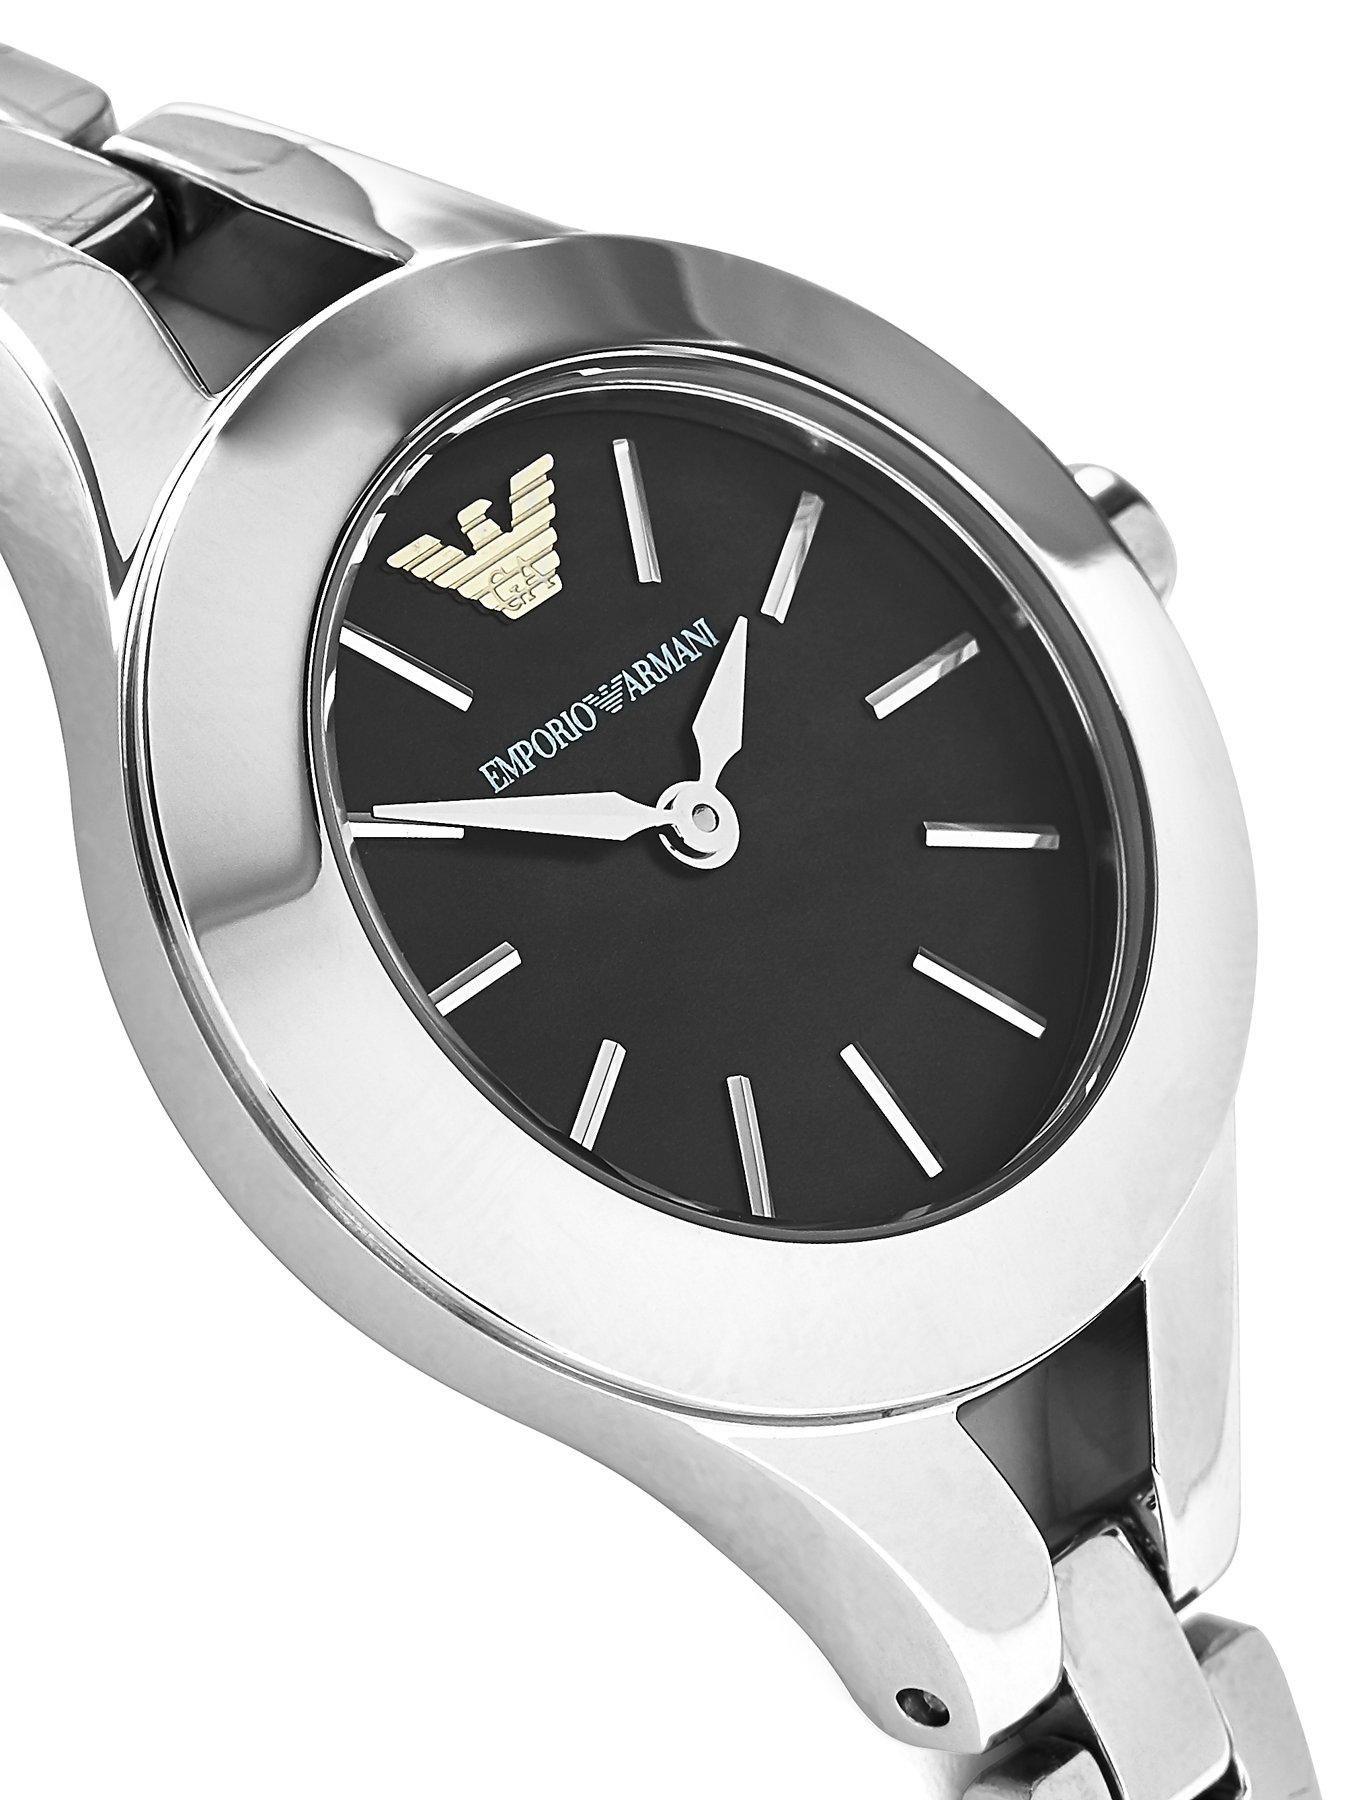 Emporio Armani Contrast Dial Mesh Strap Watch - NEW IN!